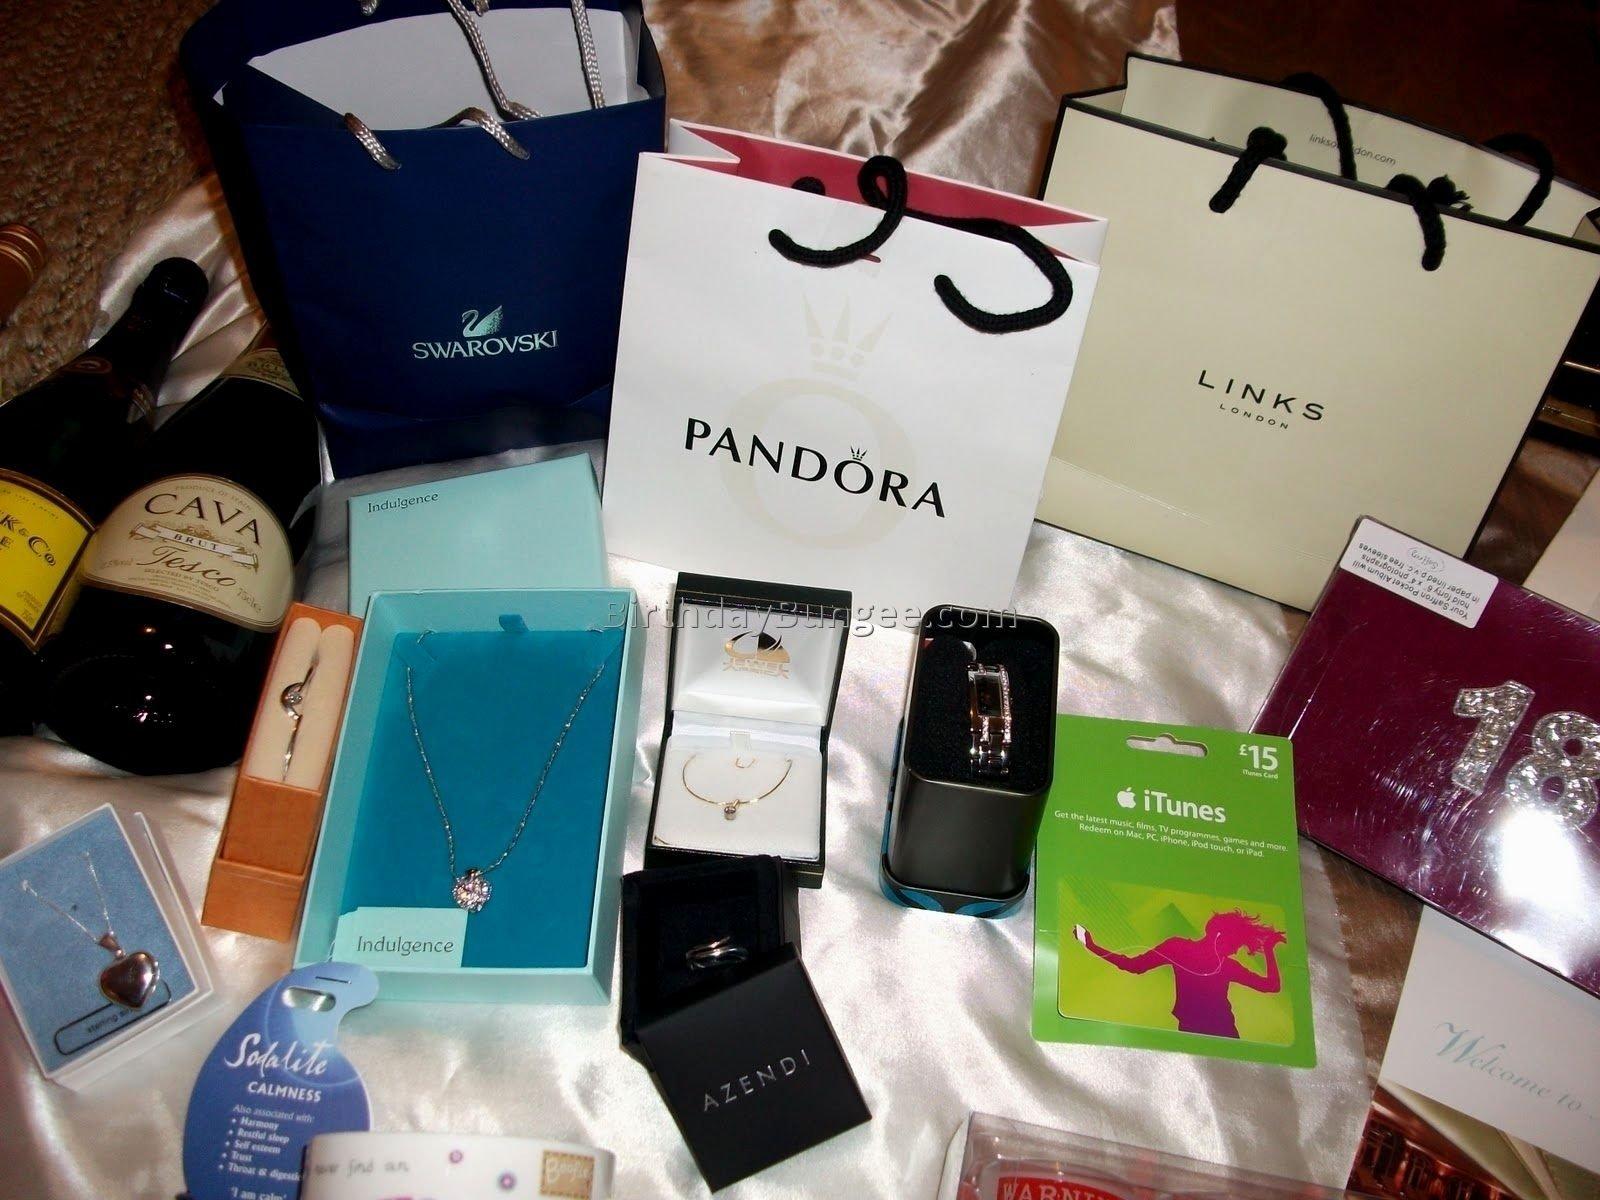 10 Awesome Birthday Present Ideas For Him 18th birthday gift ideas for boyfriend journalingsage 4 2020